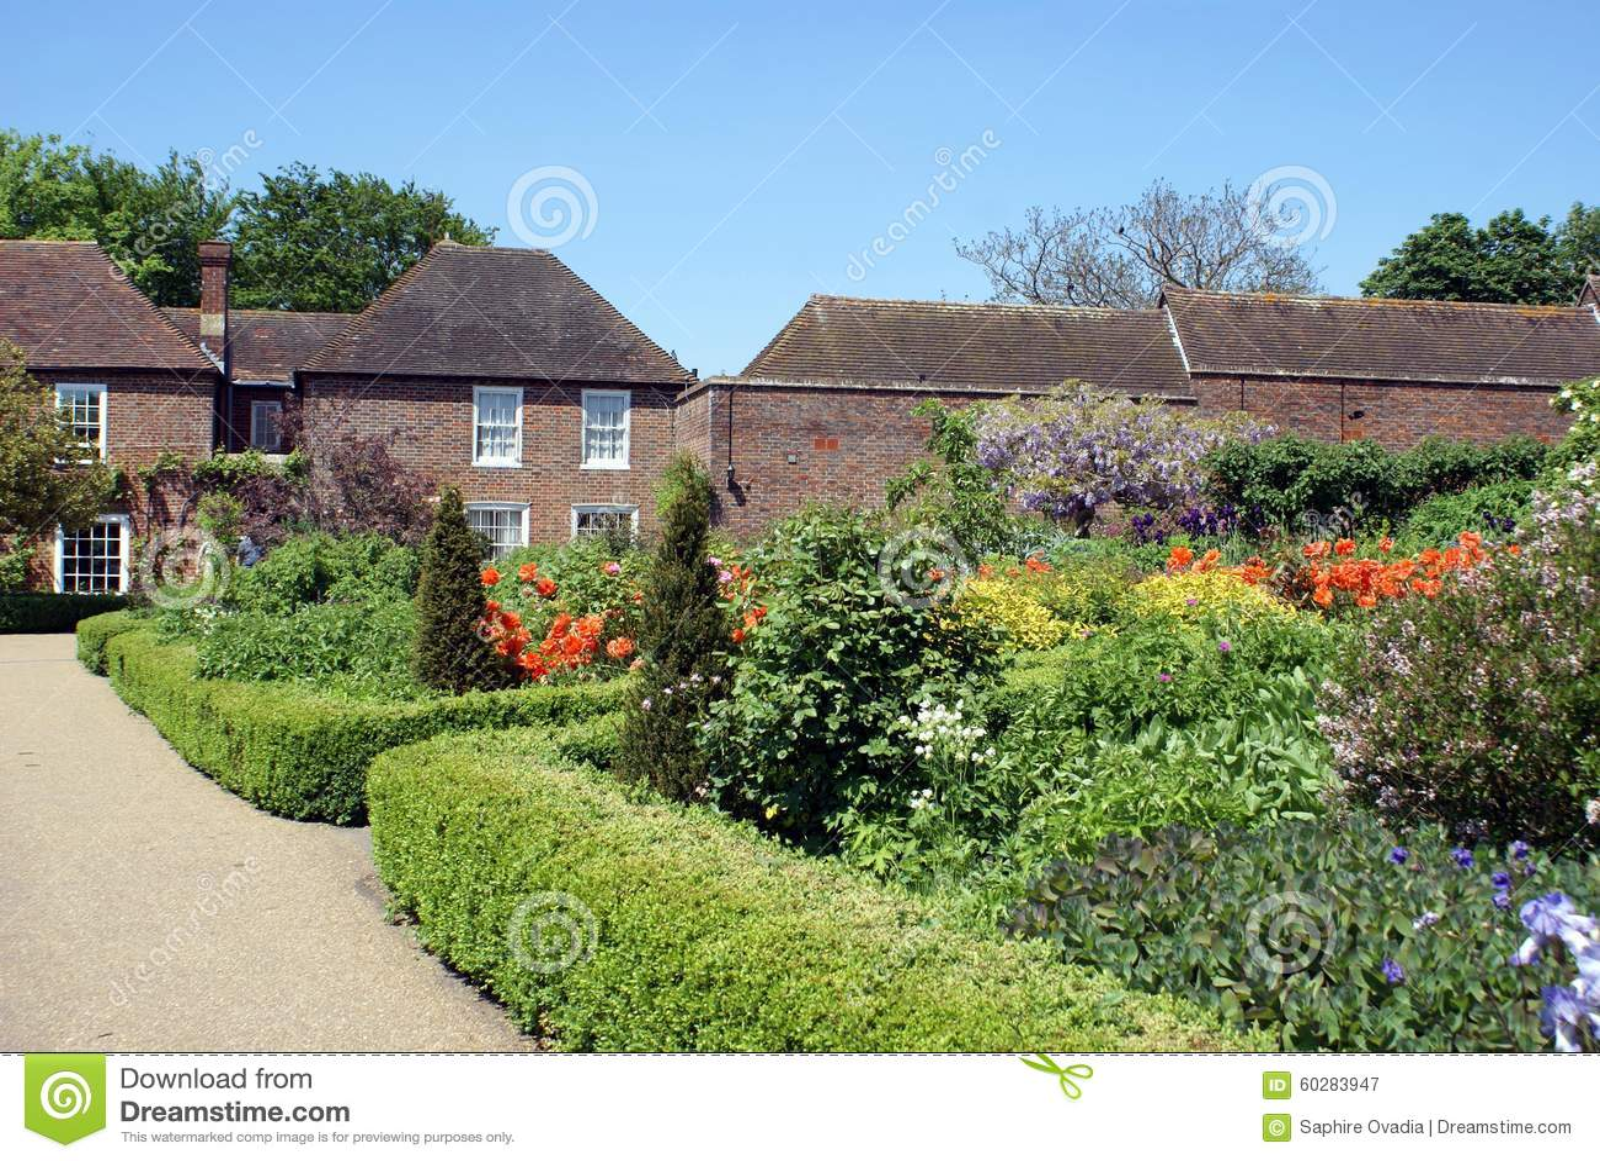 Jardin de leeds castle en angleterre photo stock image for Jardin anglais en angleterre